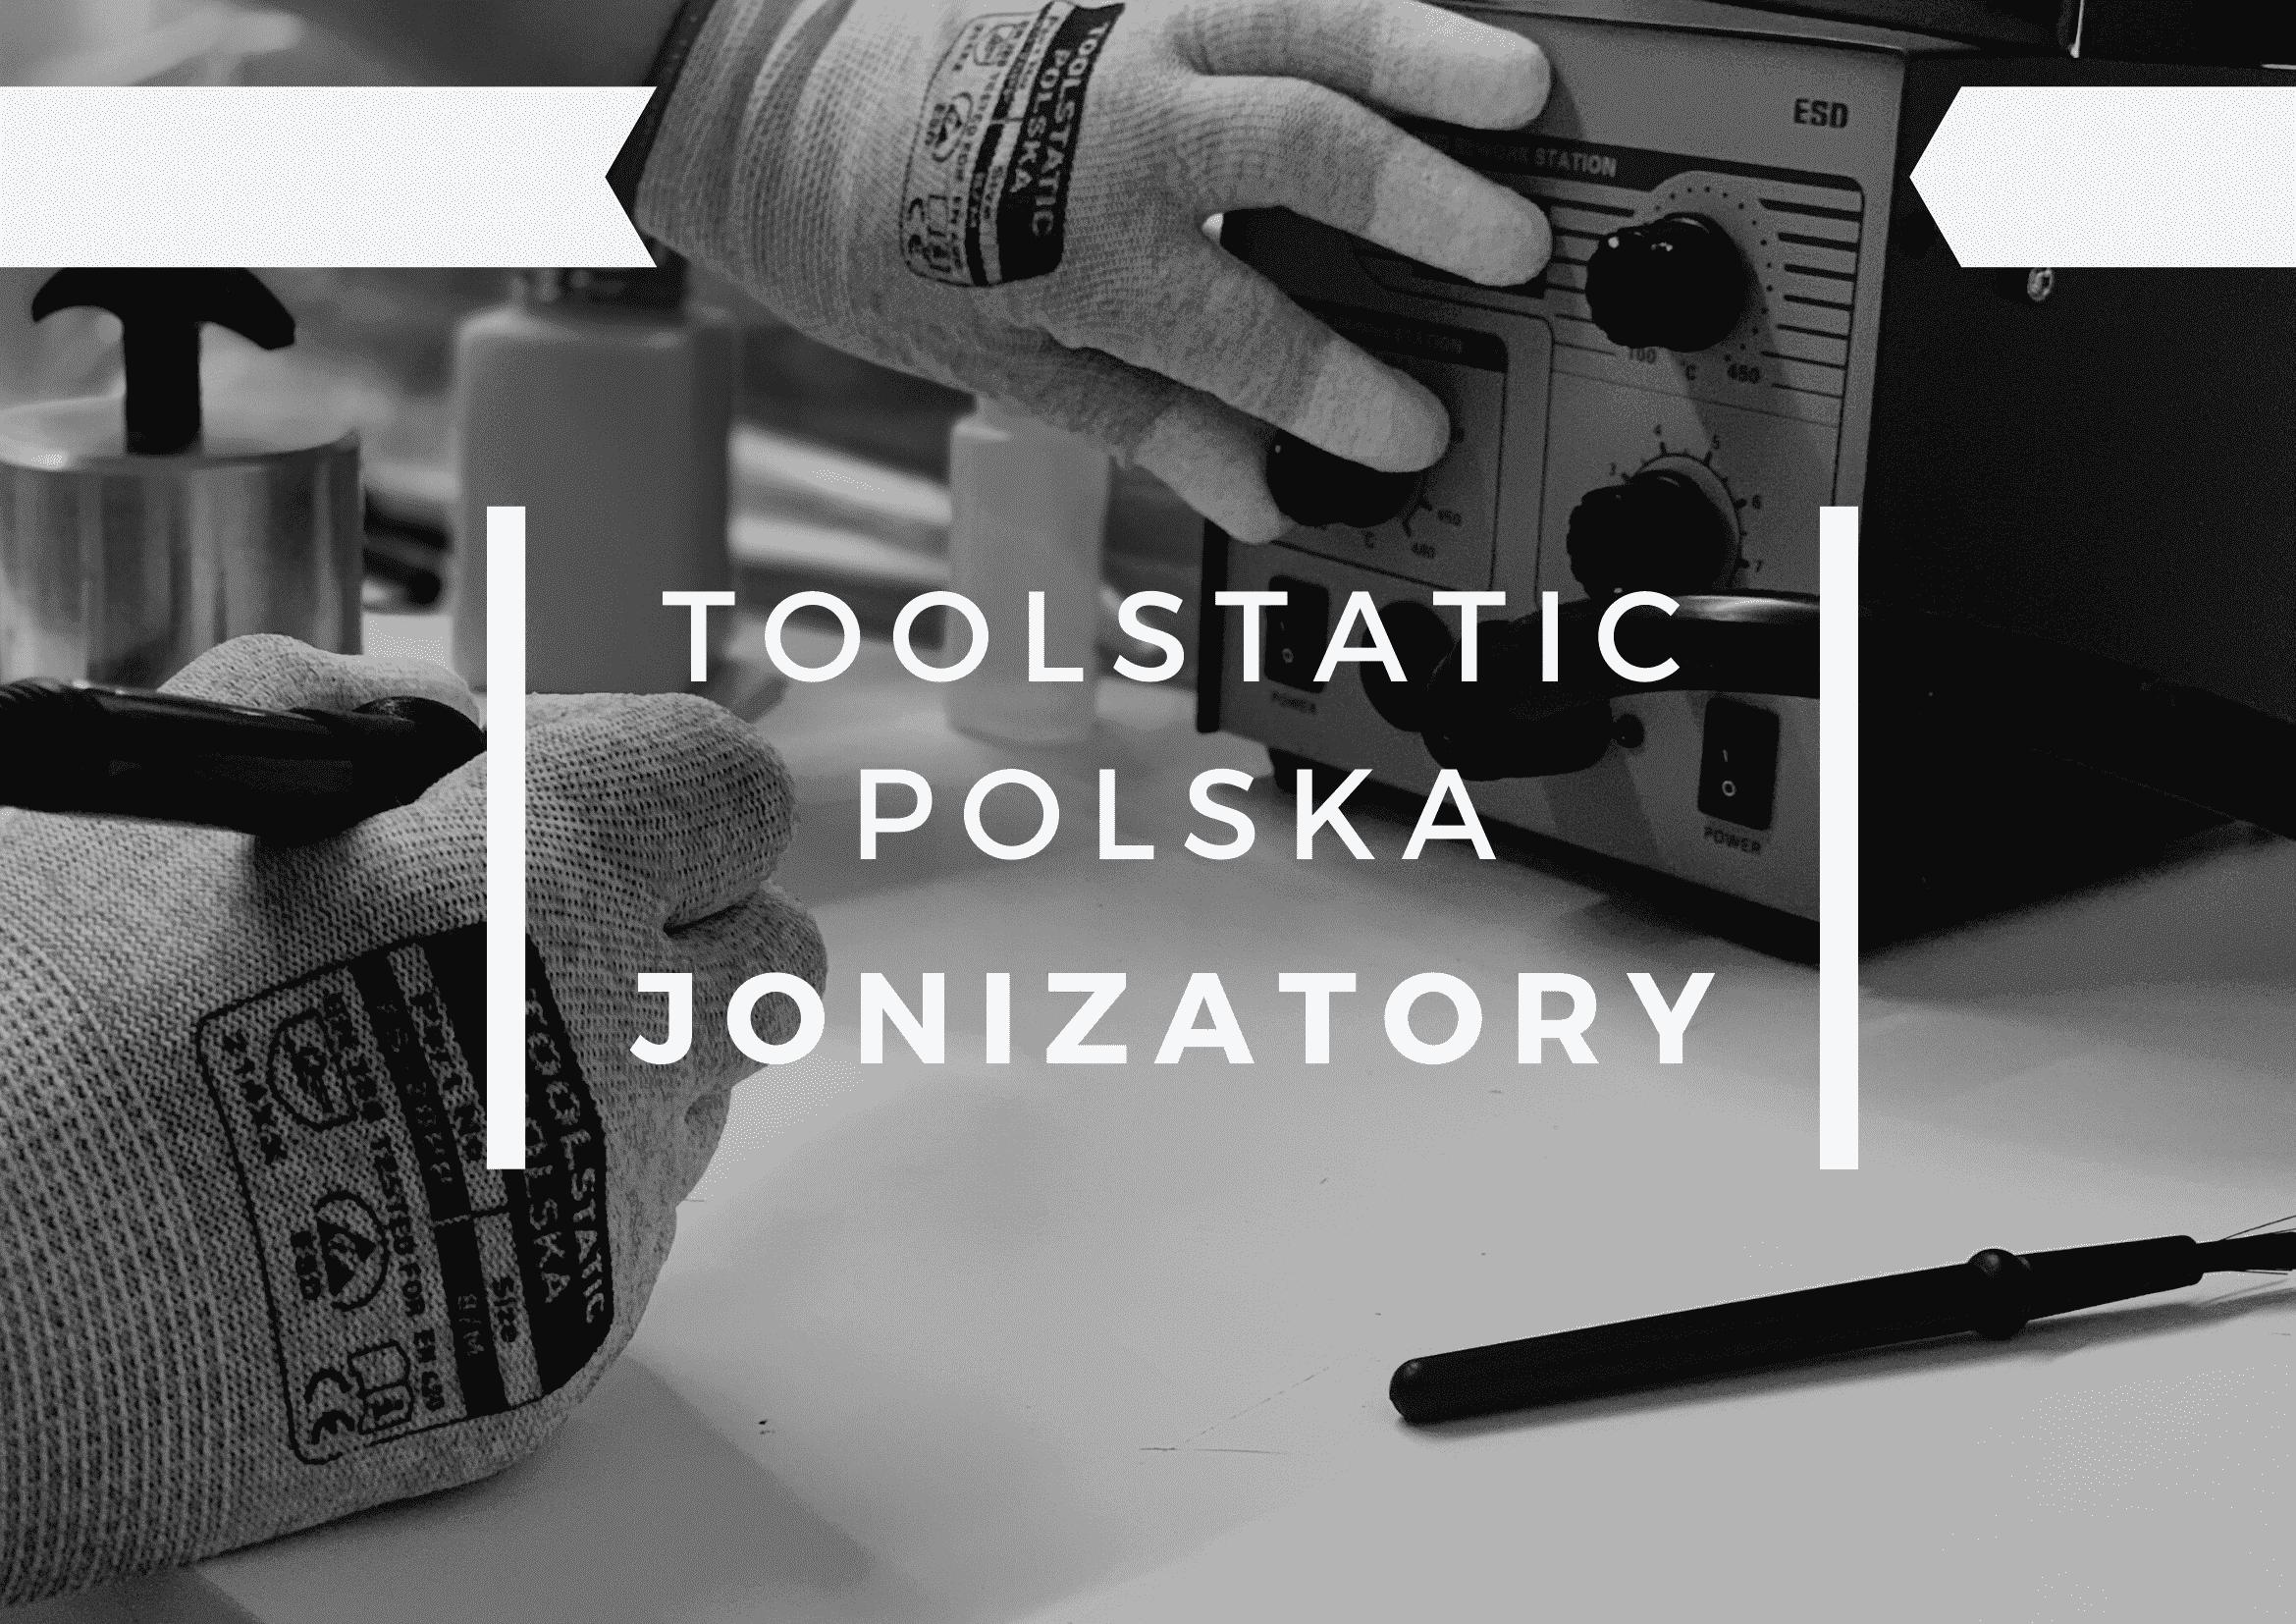 toolstatic polska jonizatory